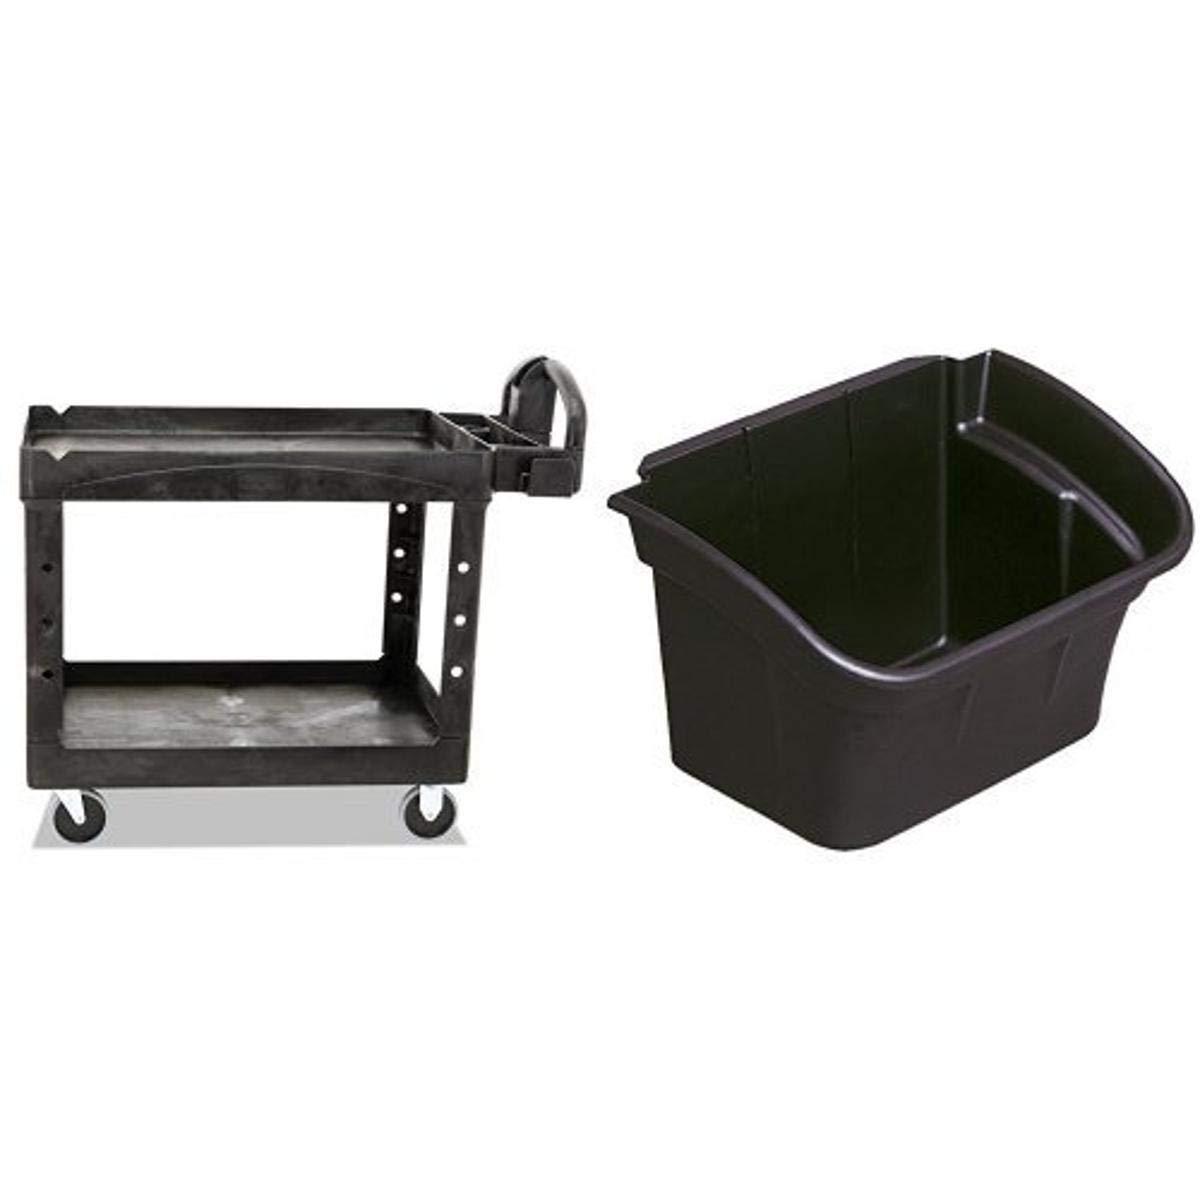 Rubbermaid Commercial Heavy-Duty 2 Shelf Utility Cart, Lipped Shelves, Medium with Commercial Utility Bin, 4gal, Black (RCP335488BLA)